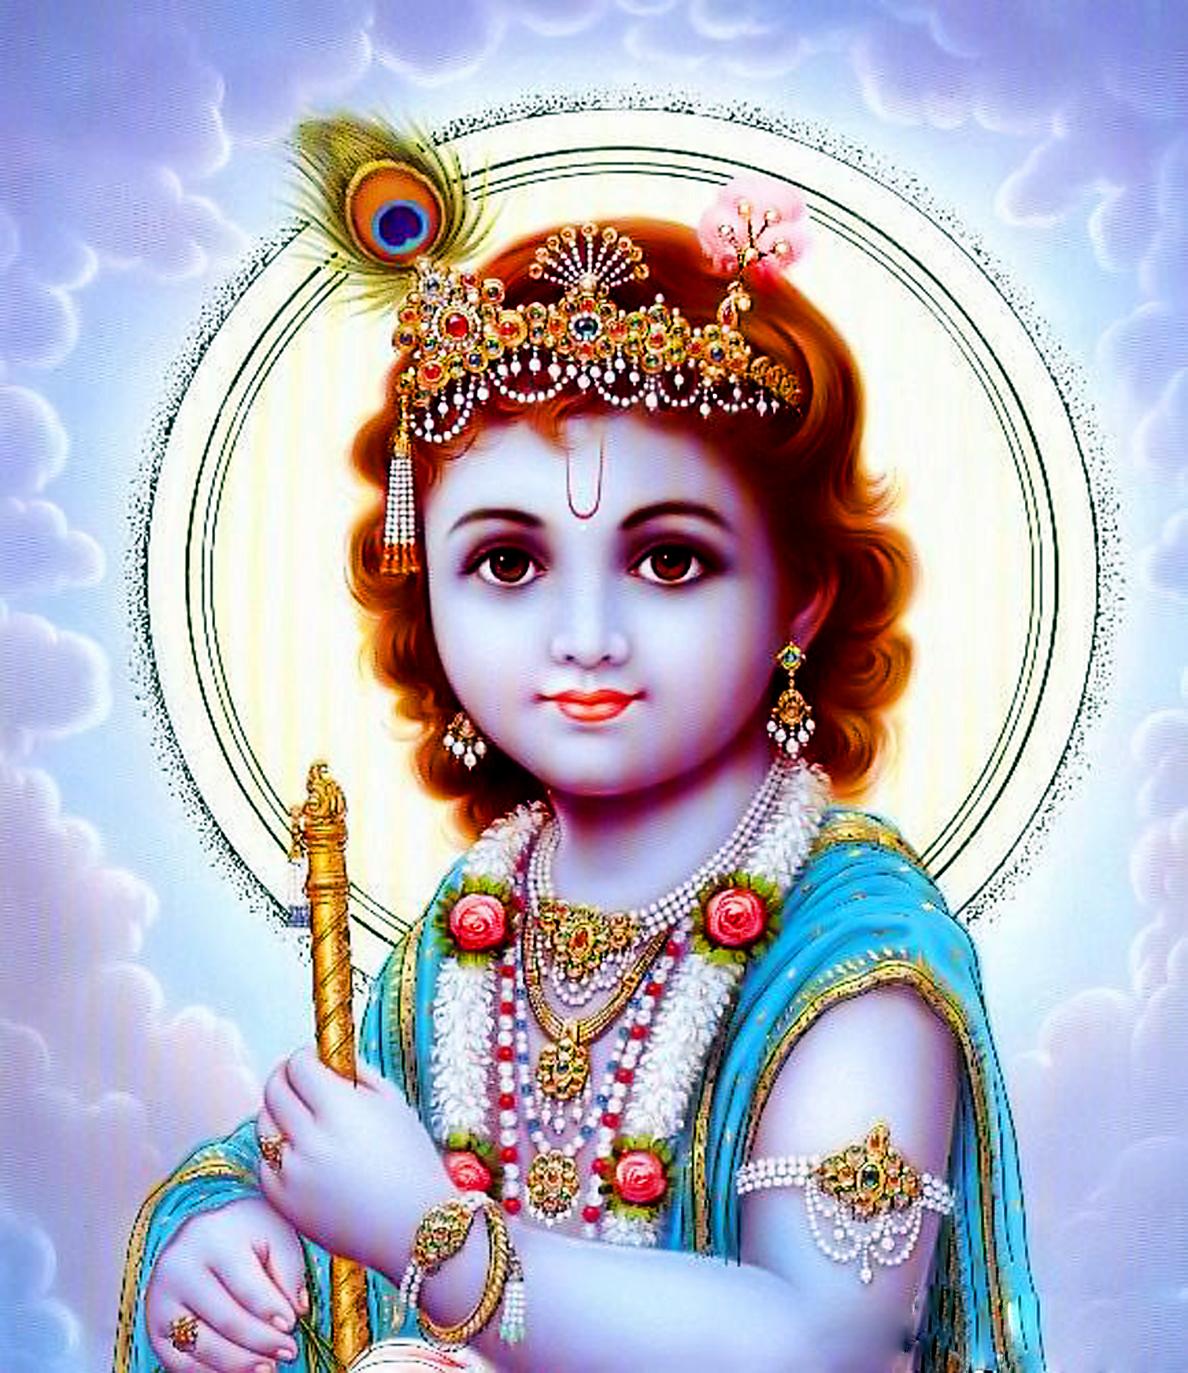 Free Download God Krishna Image High Defination Hd Wallpaper 1188x1373 For Your Desktop Mobile Tablet Explore 26 Sree Krishna Baby Beautiful 3d Wallpaper Sree Krishna Baby Beautiful 3d Wallpaper